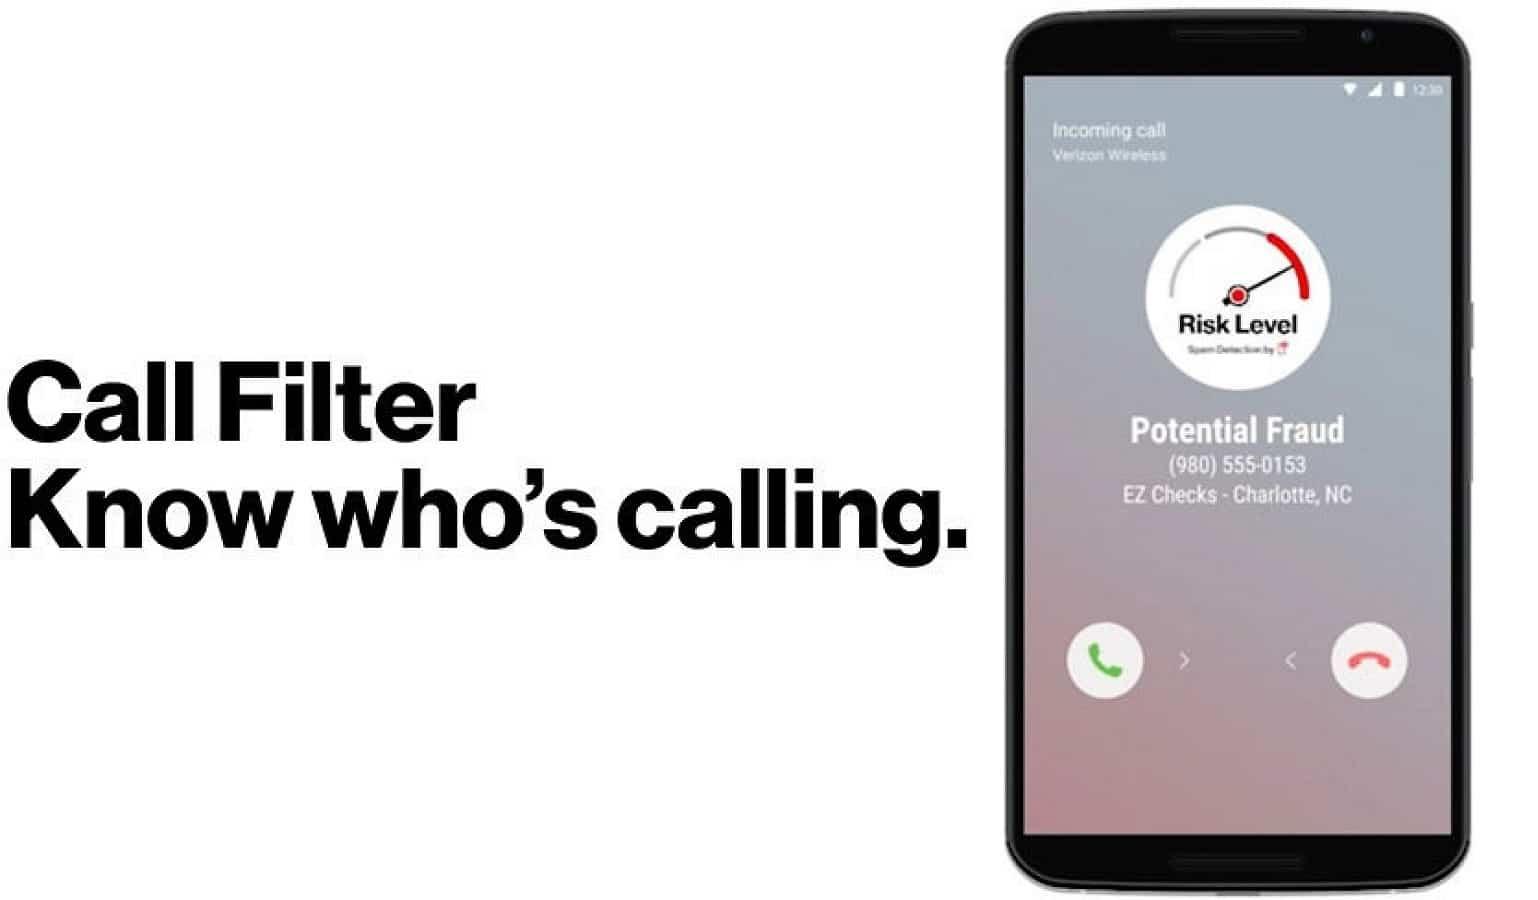 verizon call filter app